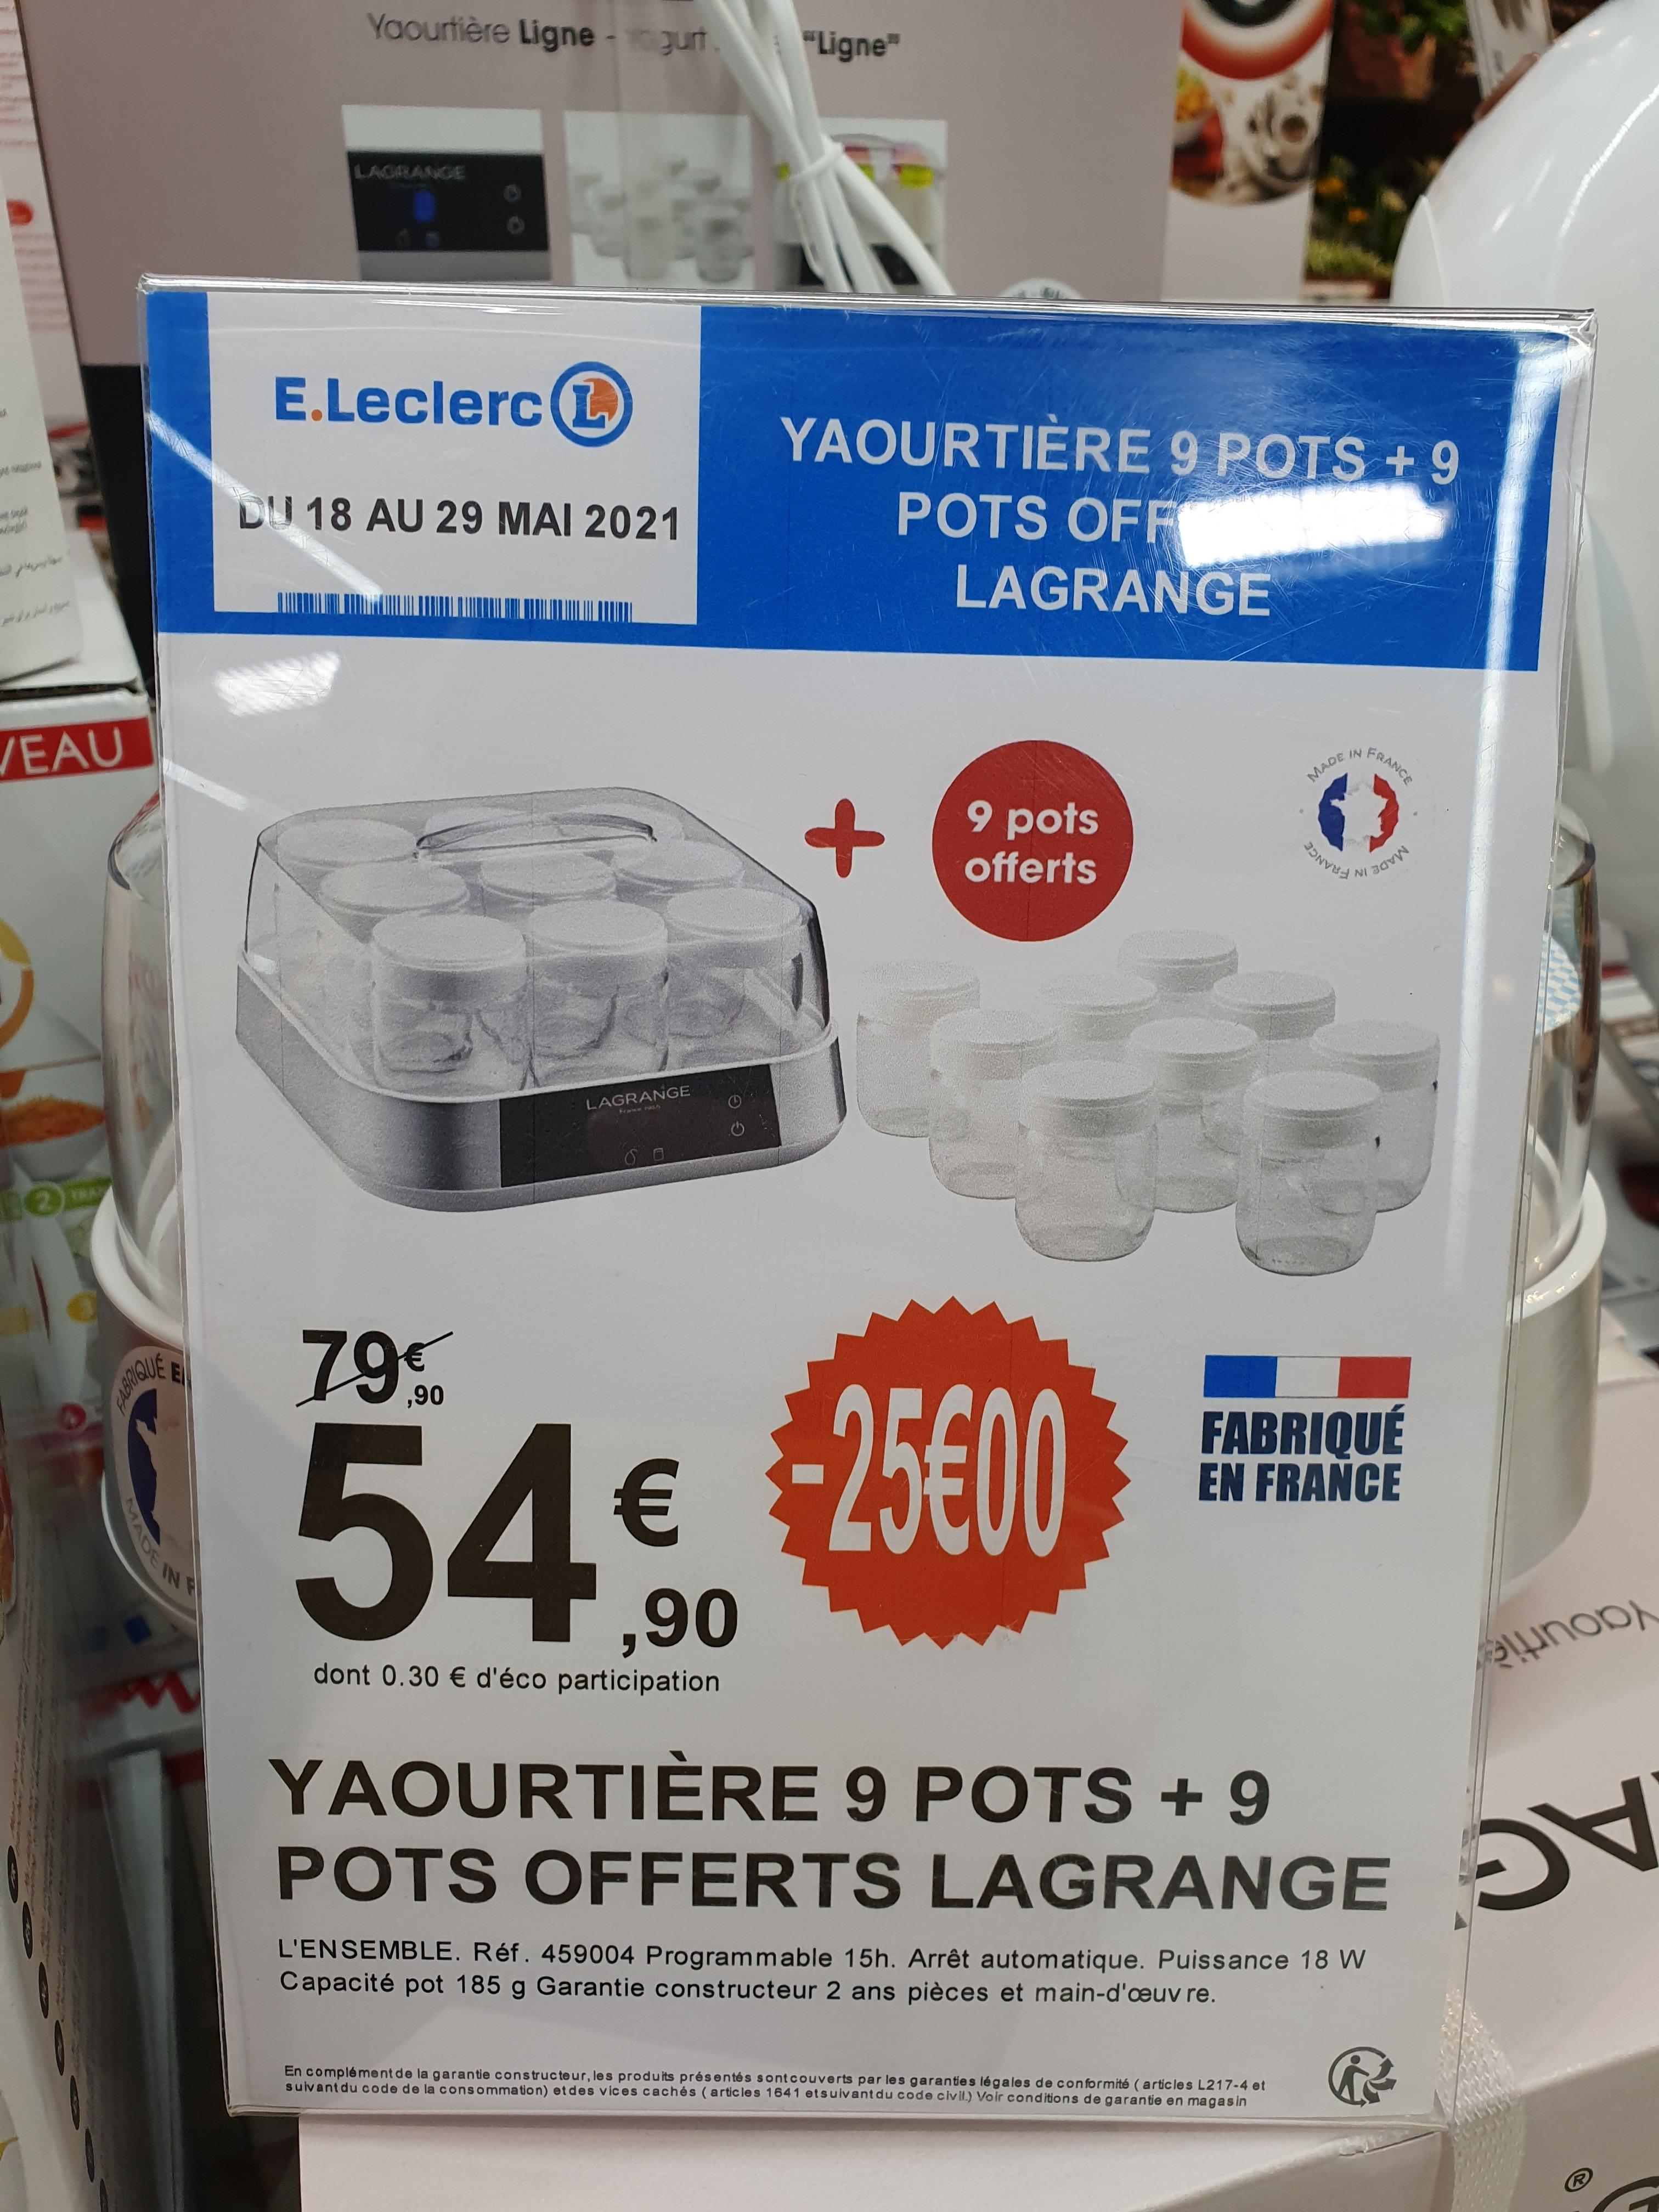 Yaourtière Lagrange 9 pots (459004) + 9 offerts